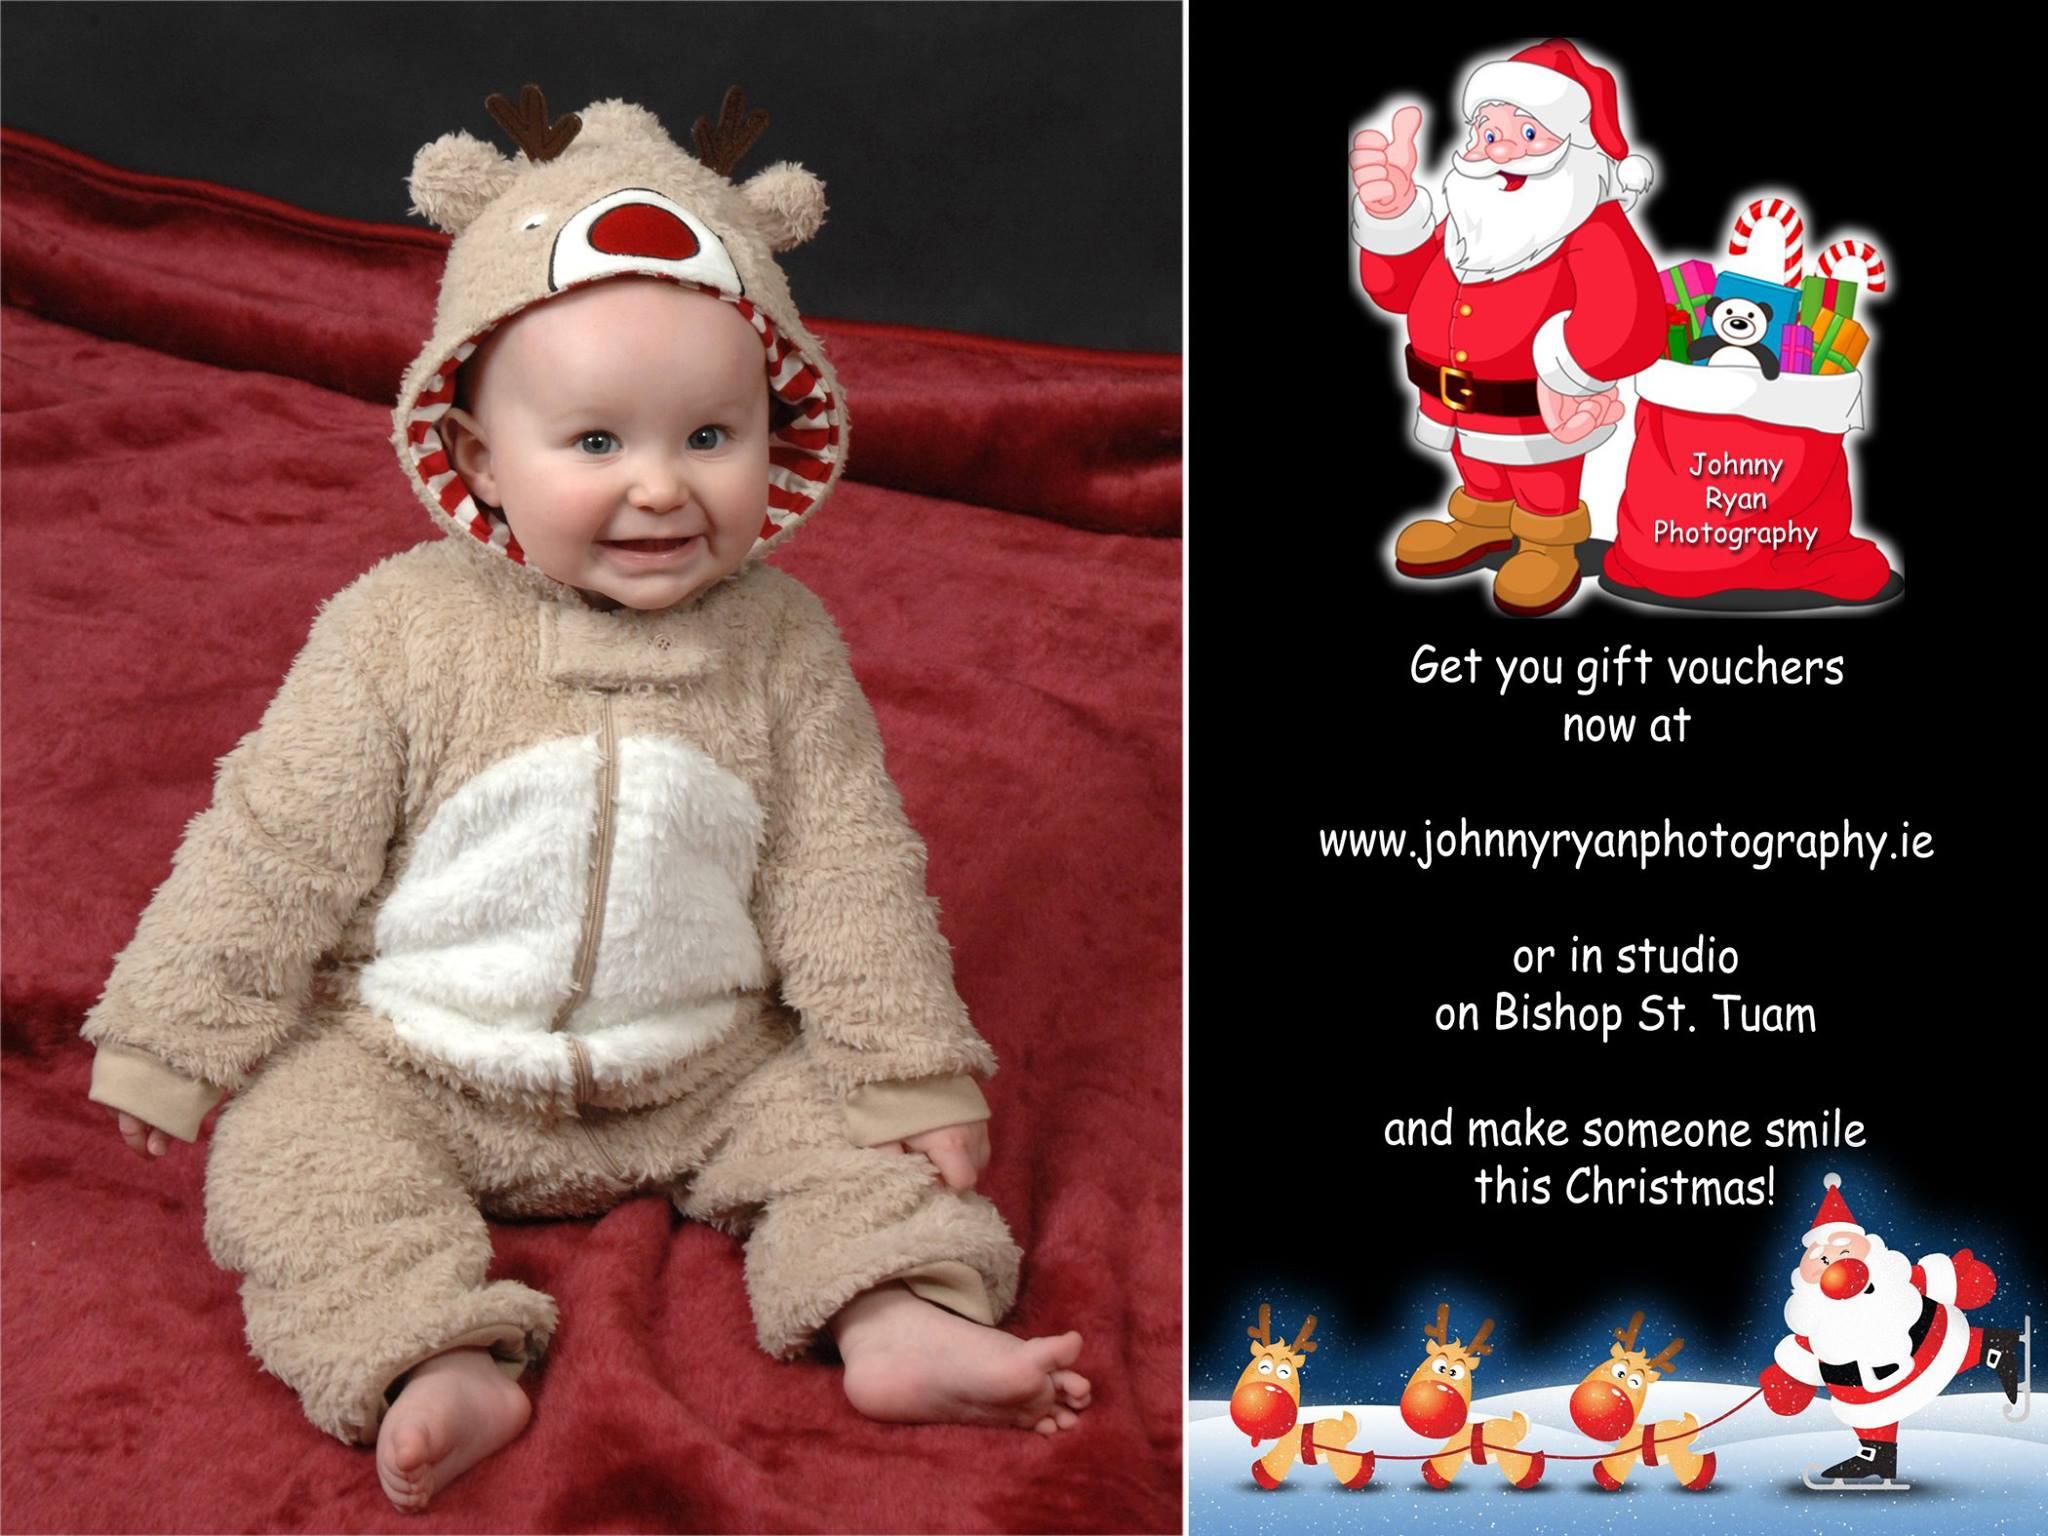 Christmas gift ideas at Johnny Ryan Photography, Tuam. - Johnny Ryan ...